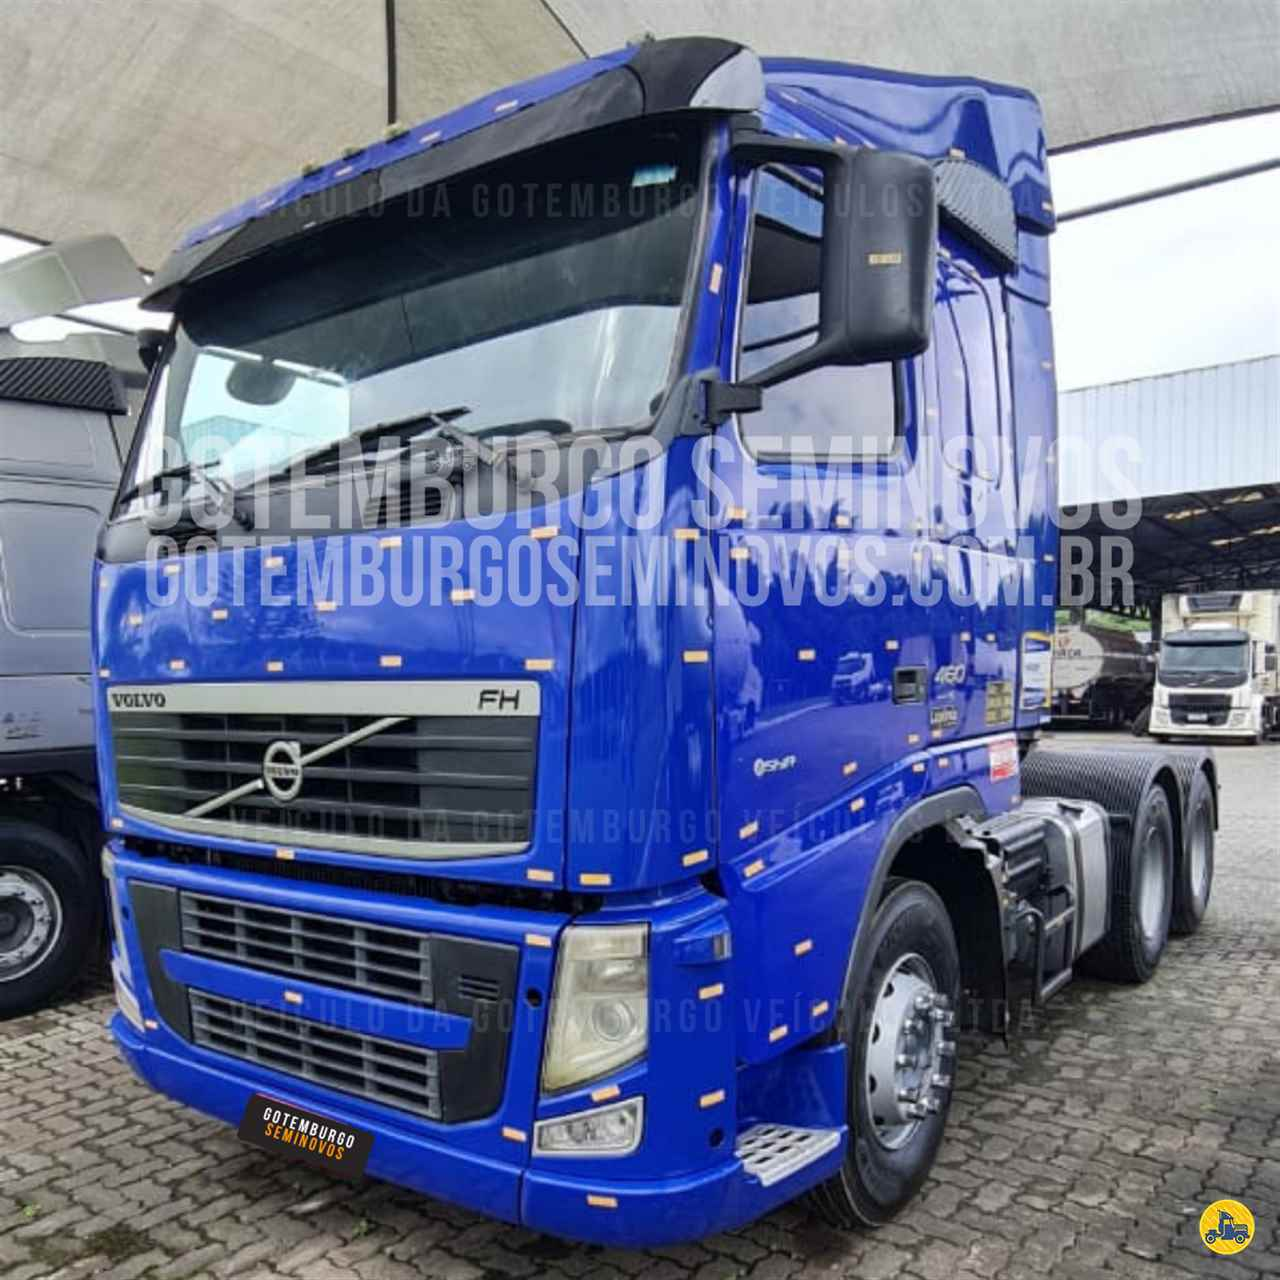 CAMINHAO VOLVO VOLVO FH 460 Cavalo Mecânico Truck 6x2 Gotemburgo - VOLVO no Nordeste SIMOES FILHO BAHIA BA